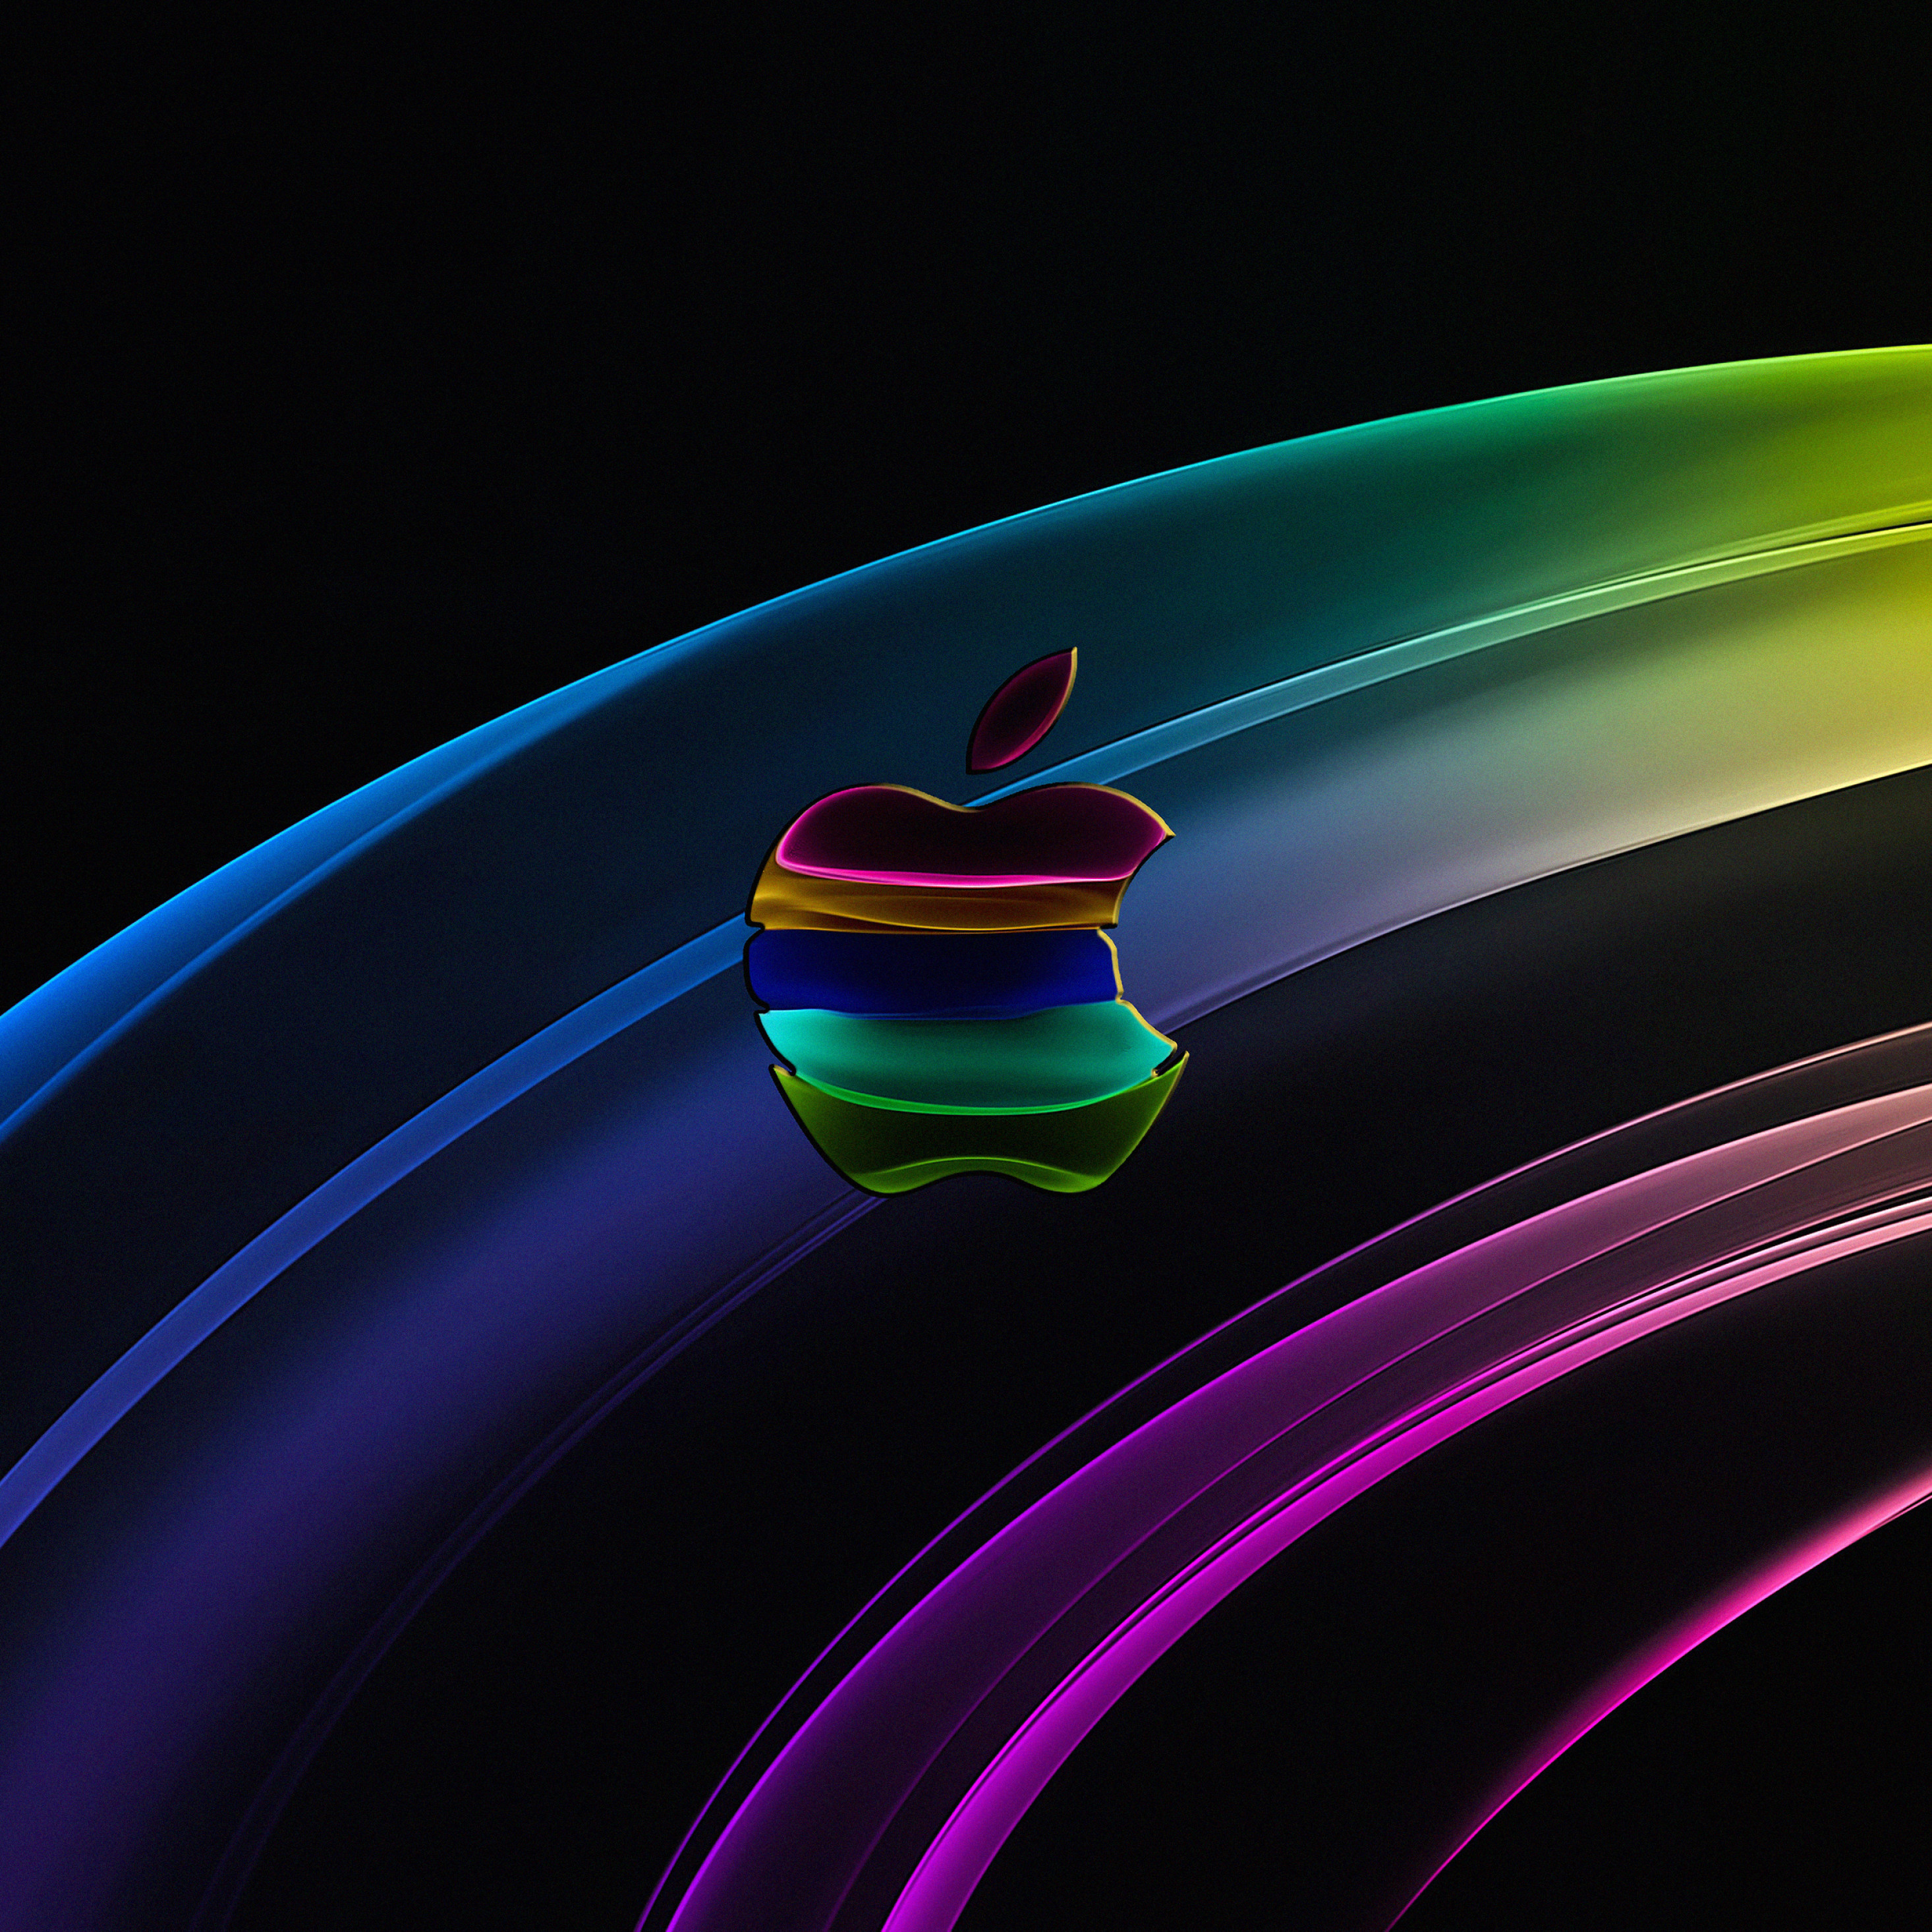 Iphone 11 Wallpaper Hd 4k 2889575 Hd Wallpaper Backgrounds Download